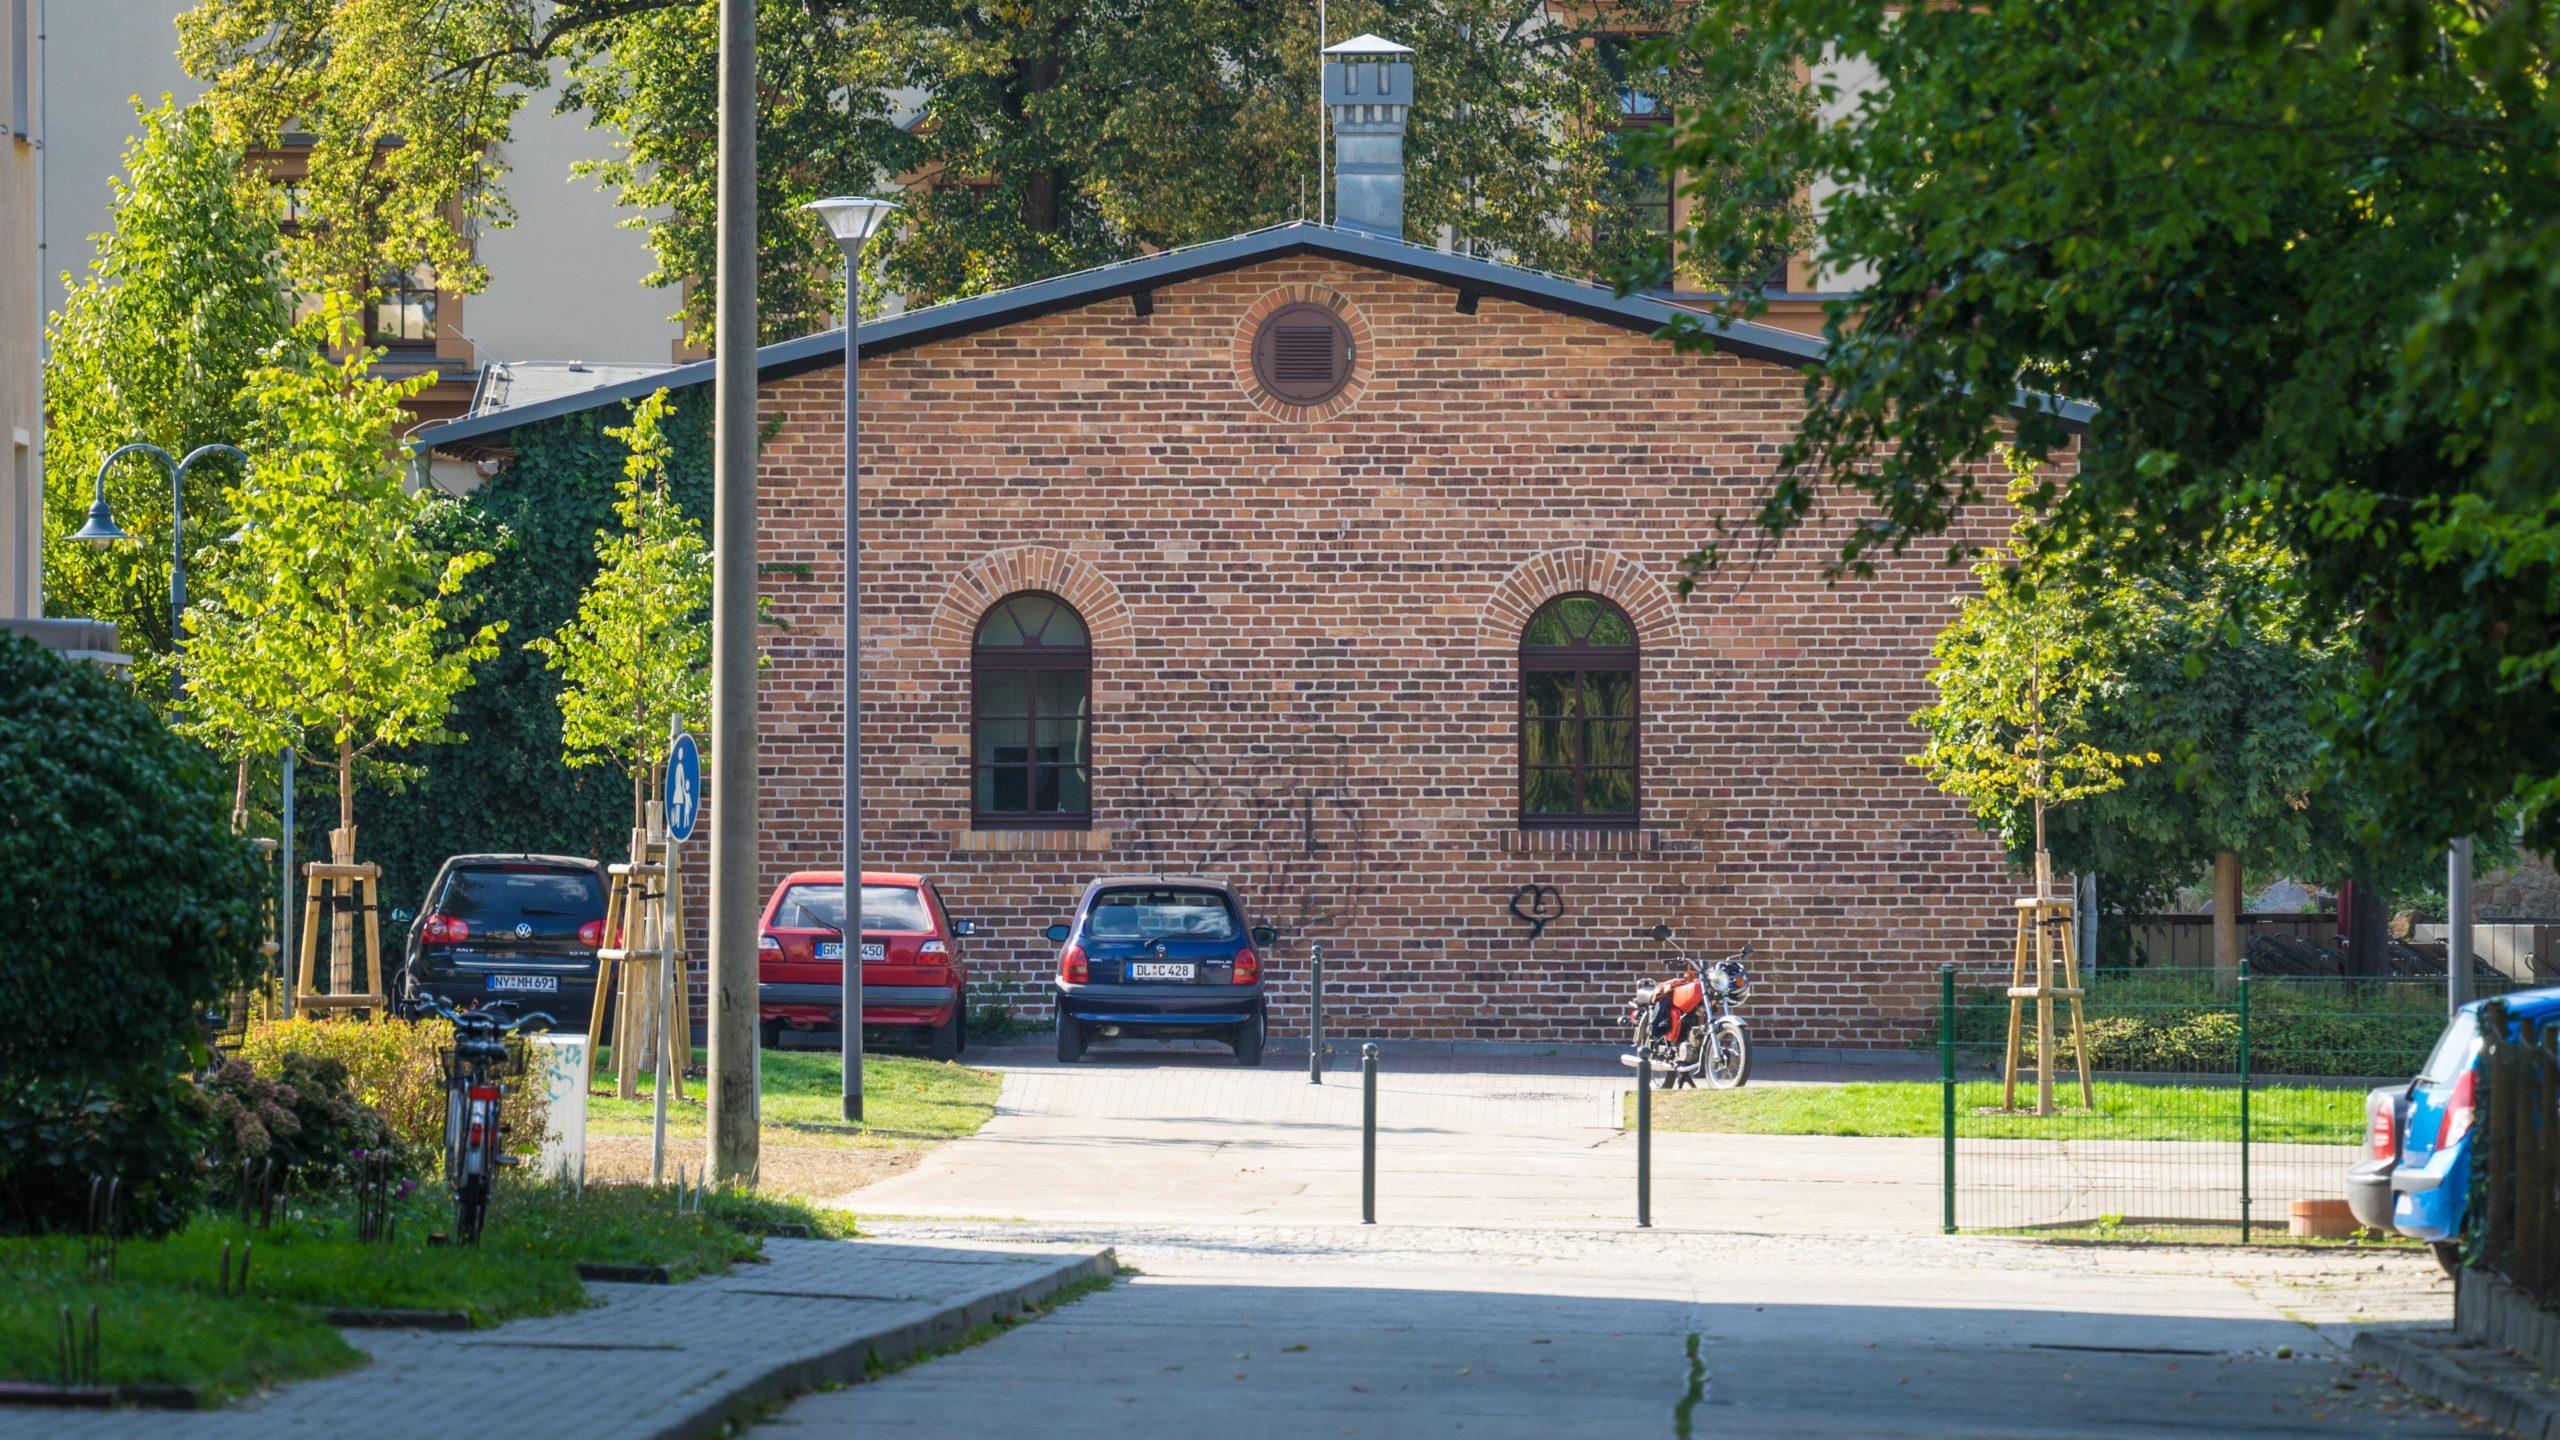 Oberlausitz, Niesky (sorbisch: Nizka), Jugendclub